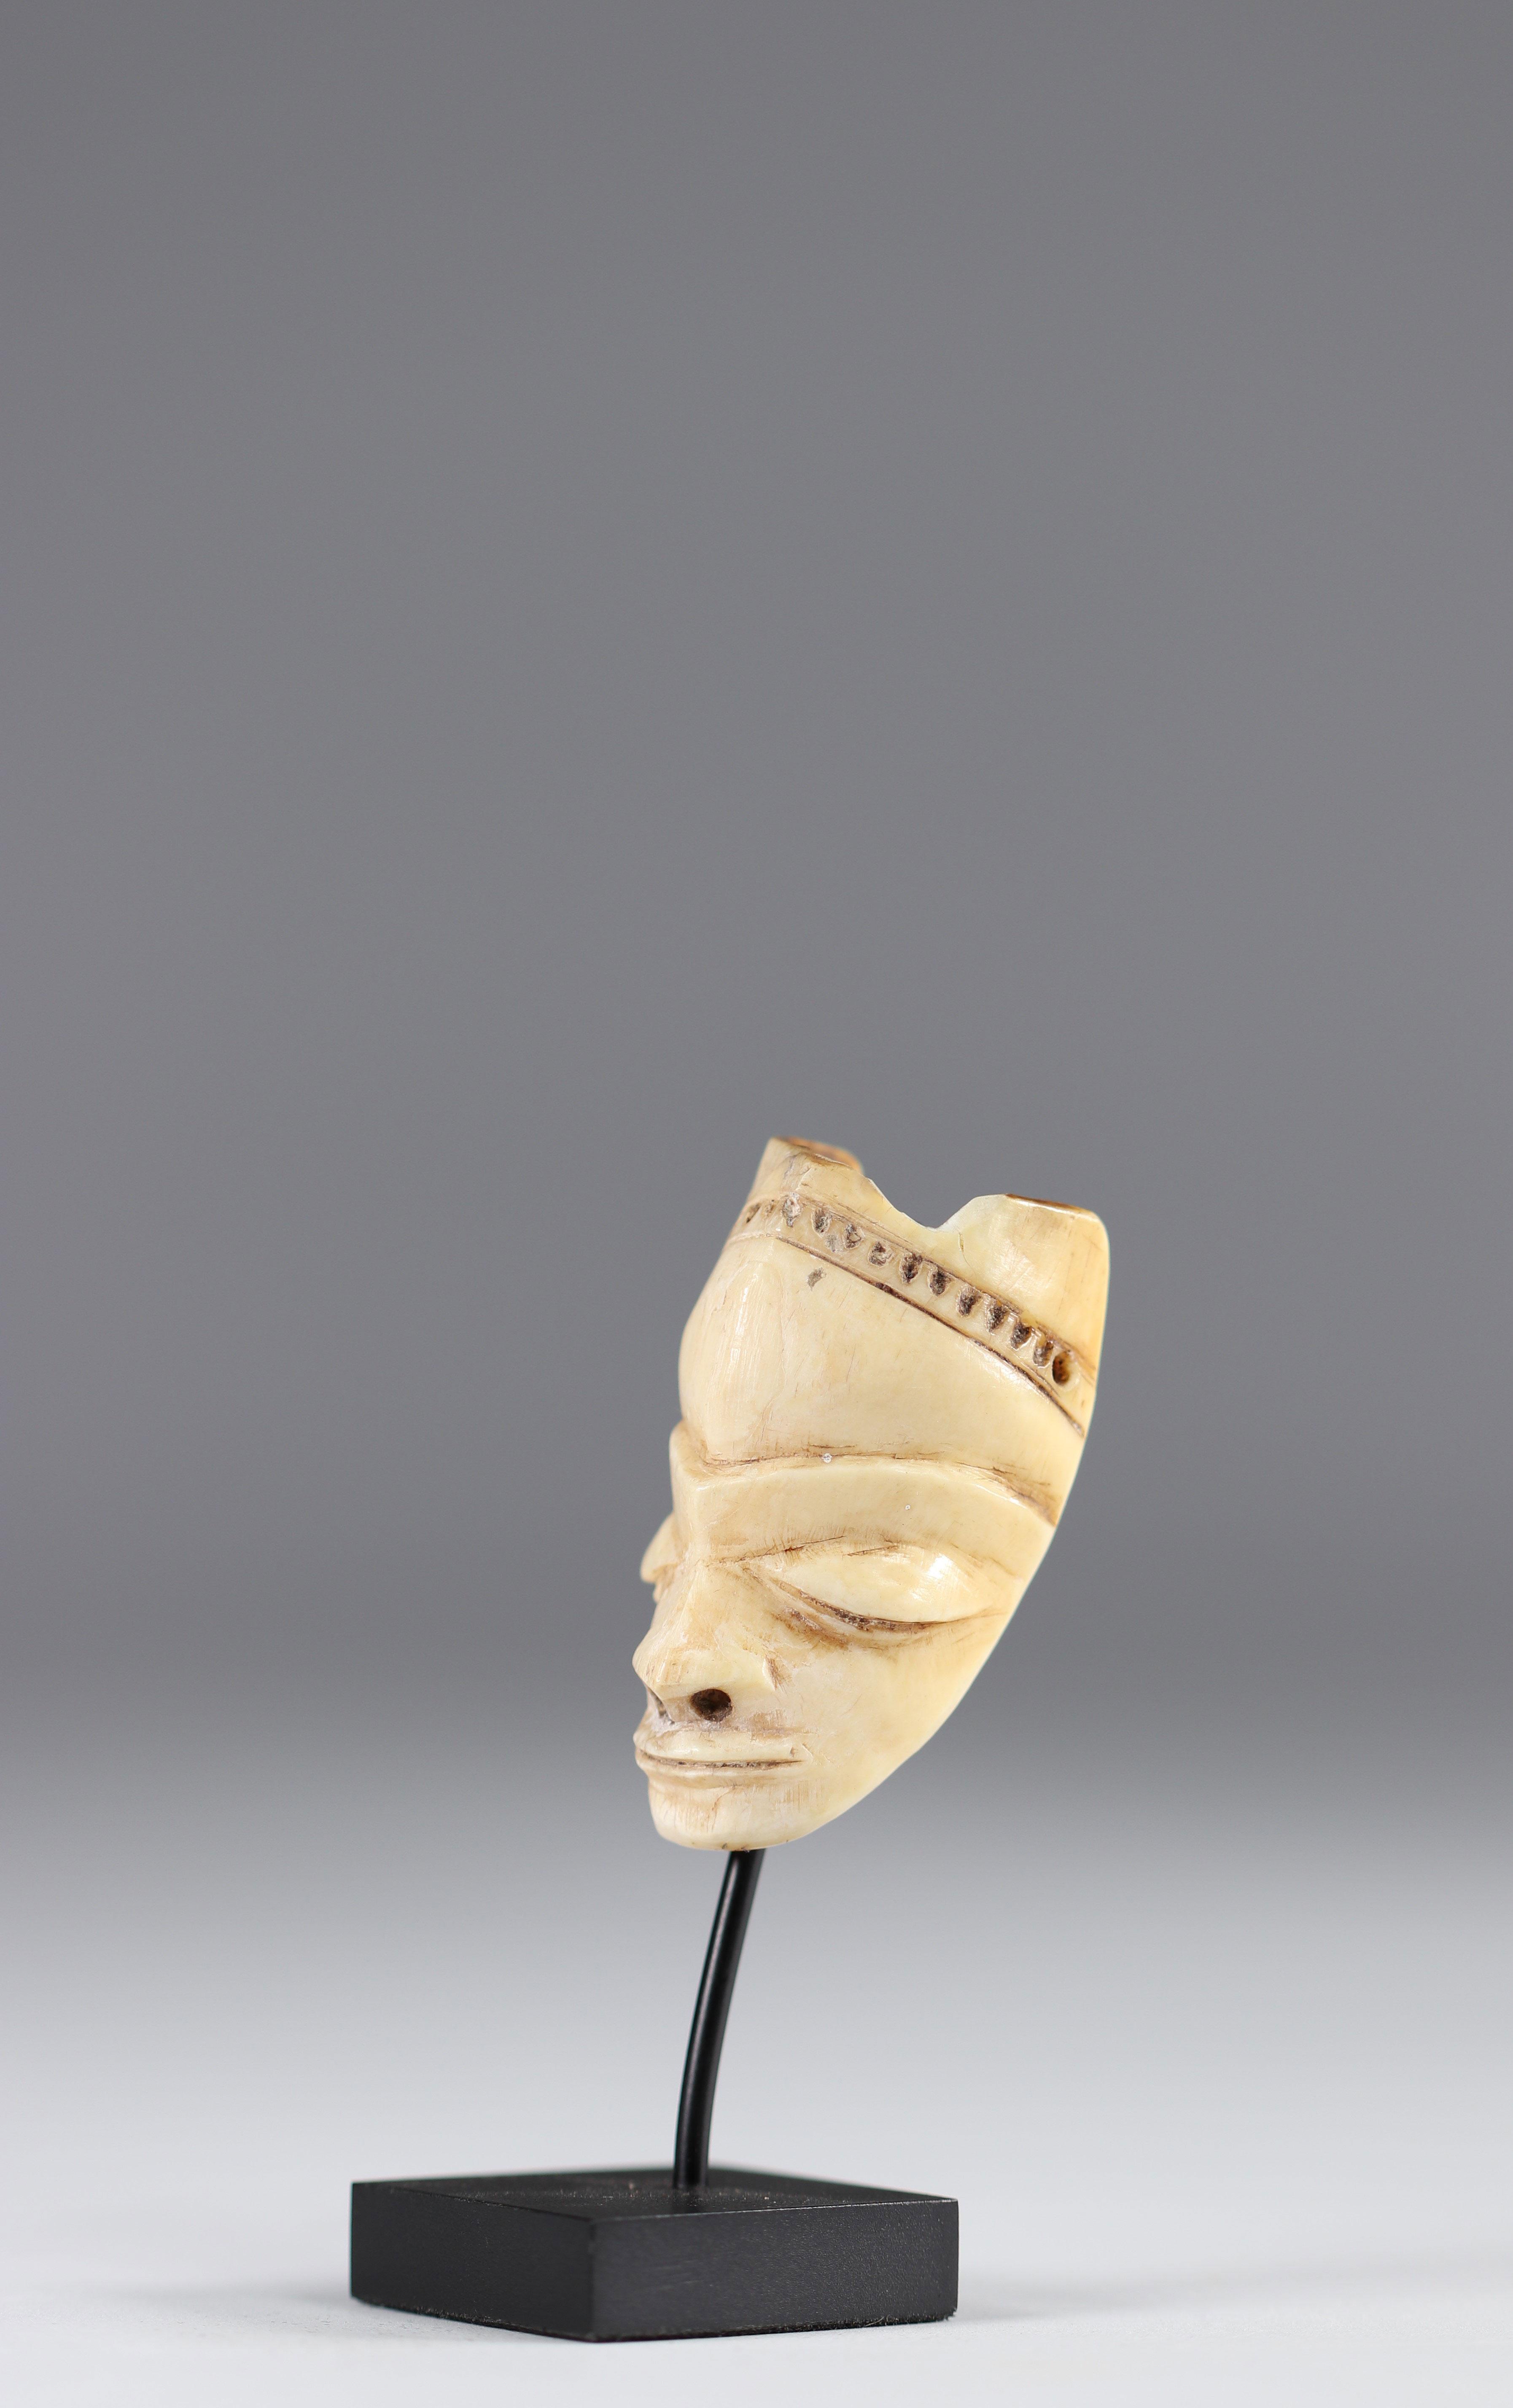 Pendant Pende ikhoko - private collar Belgium - mid 20th DRC - Africa - Image 3 of 4